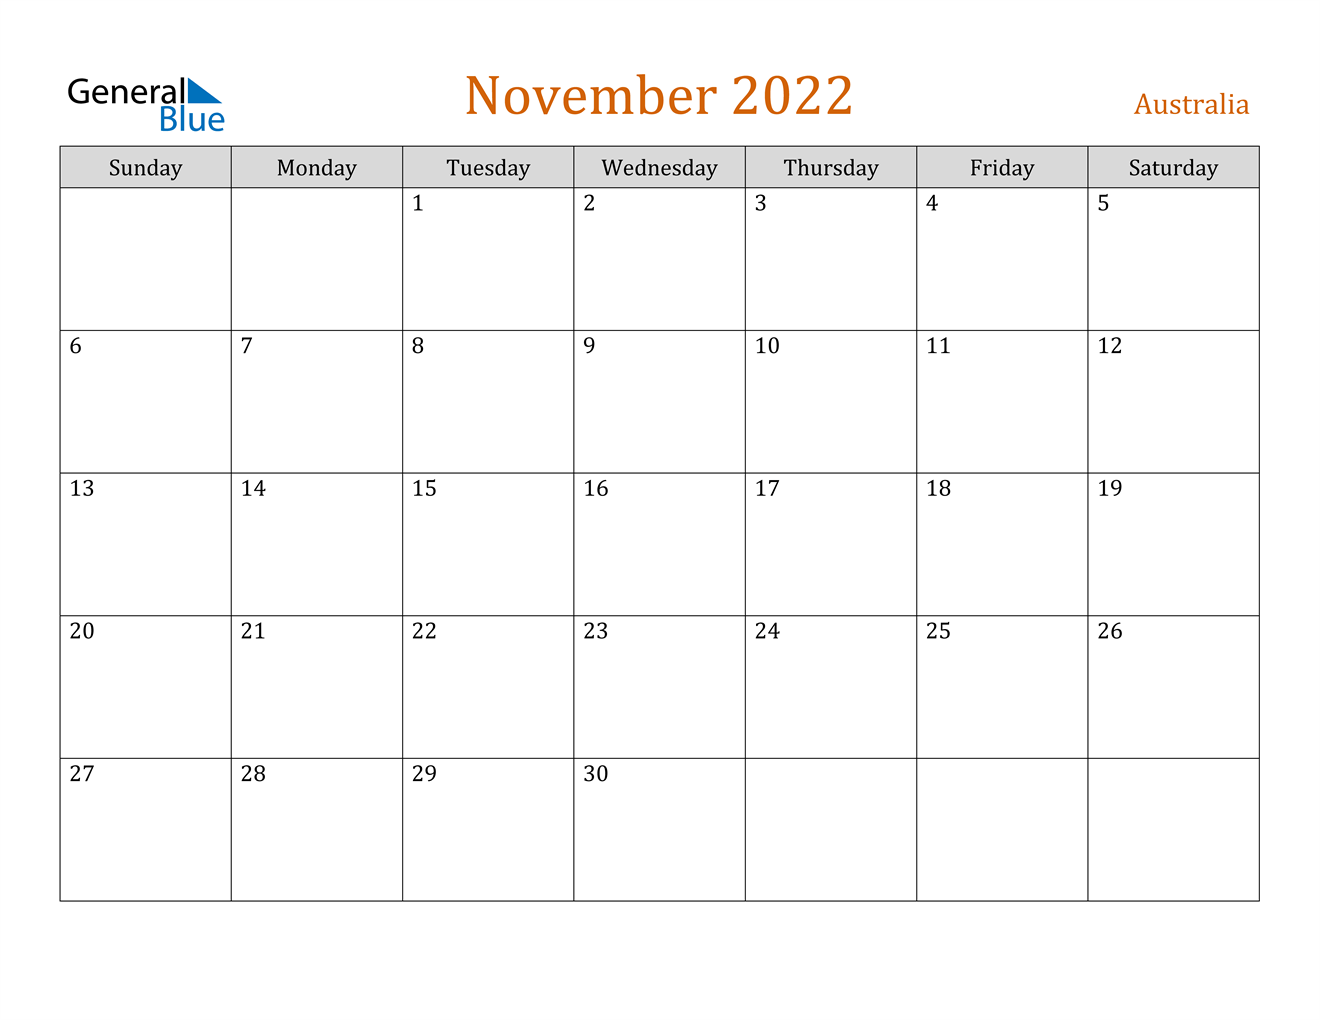 November 2022 Calendar - Australia